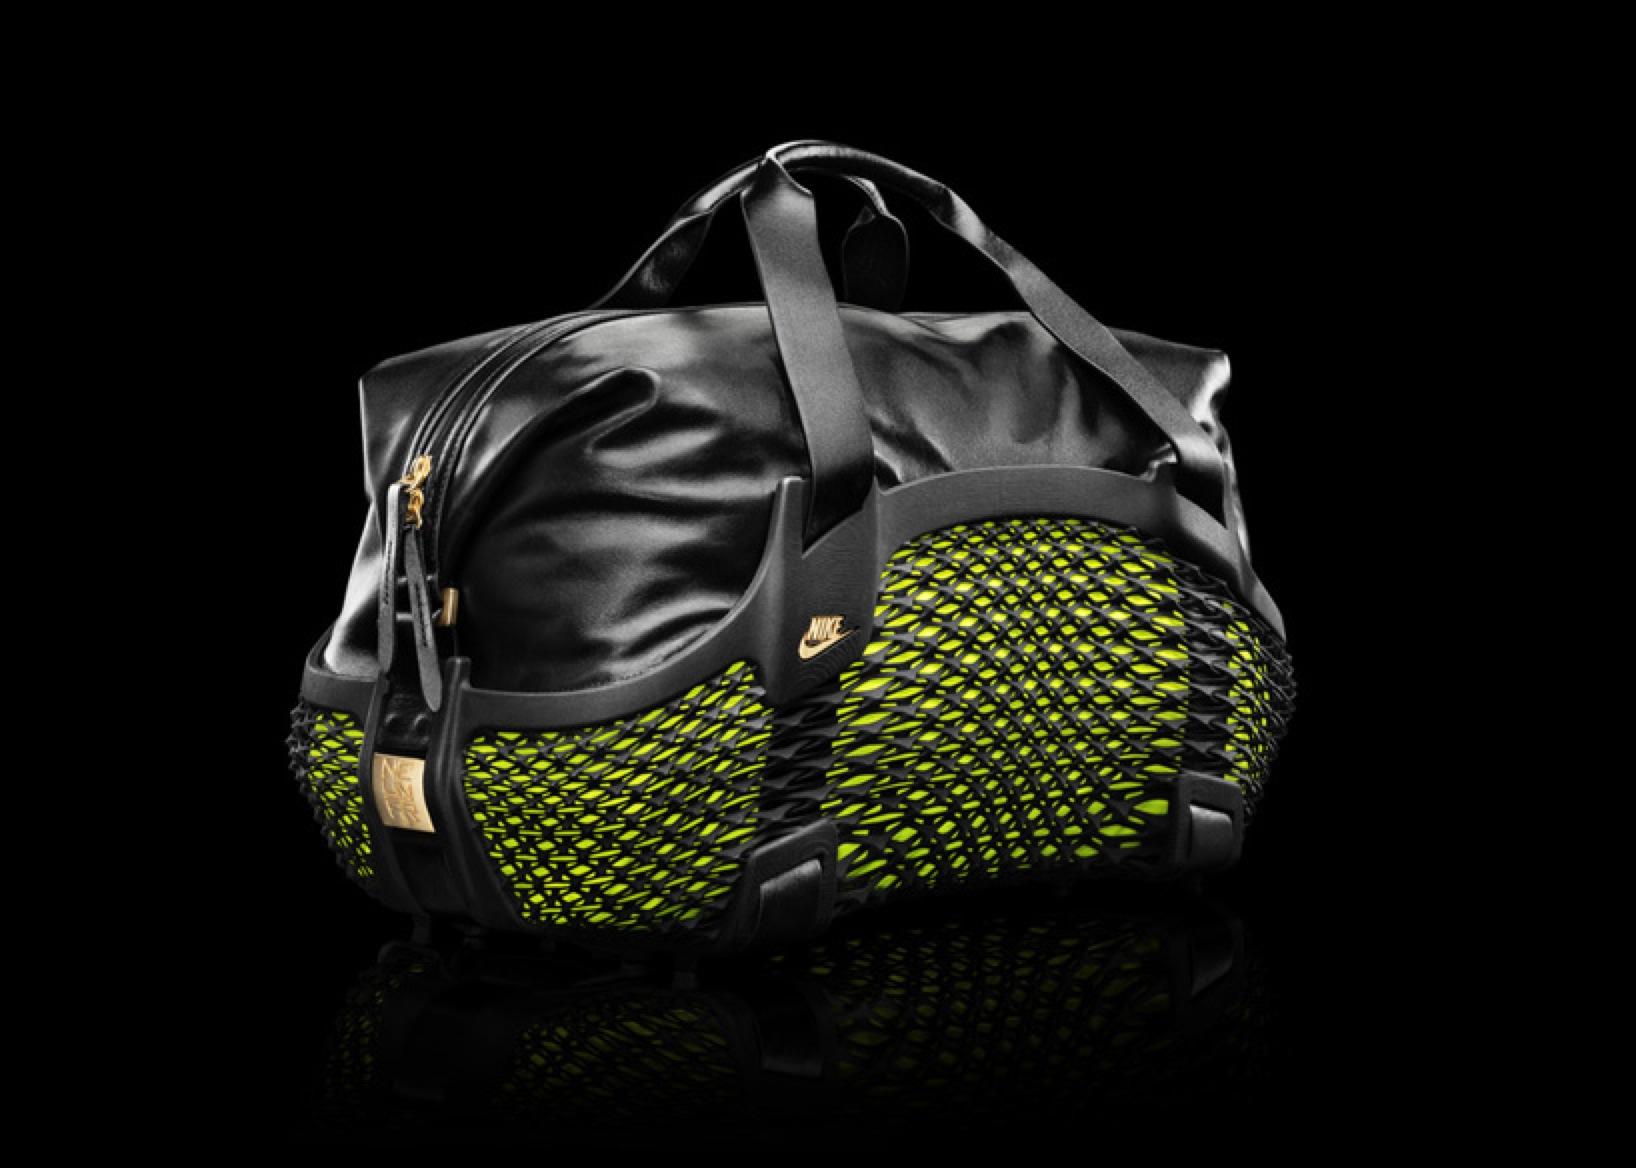 Nike-Rebento-3D-Printed-Bag-Designboom02